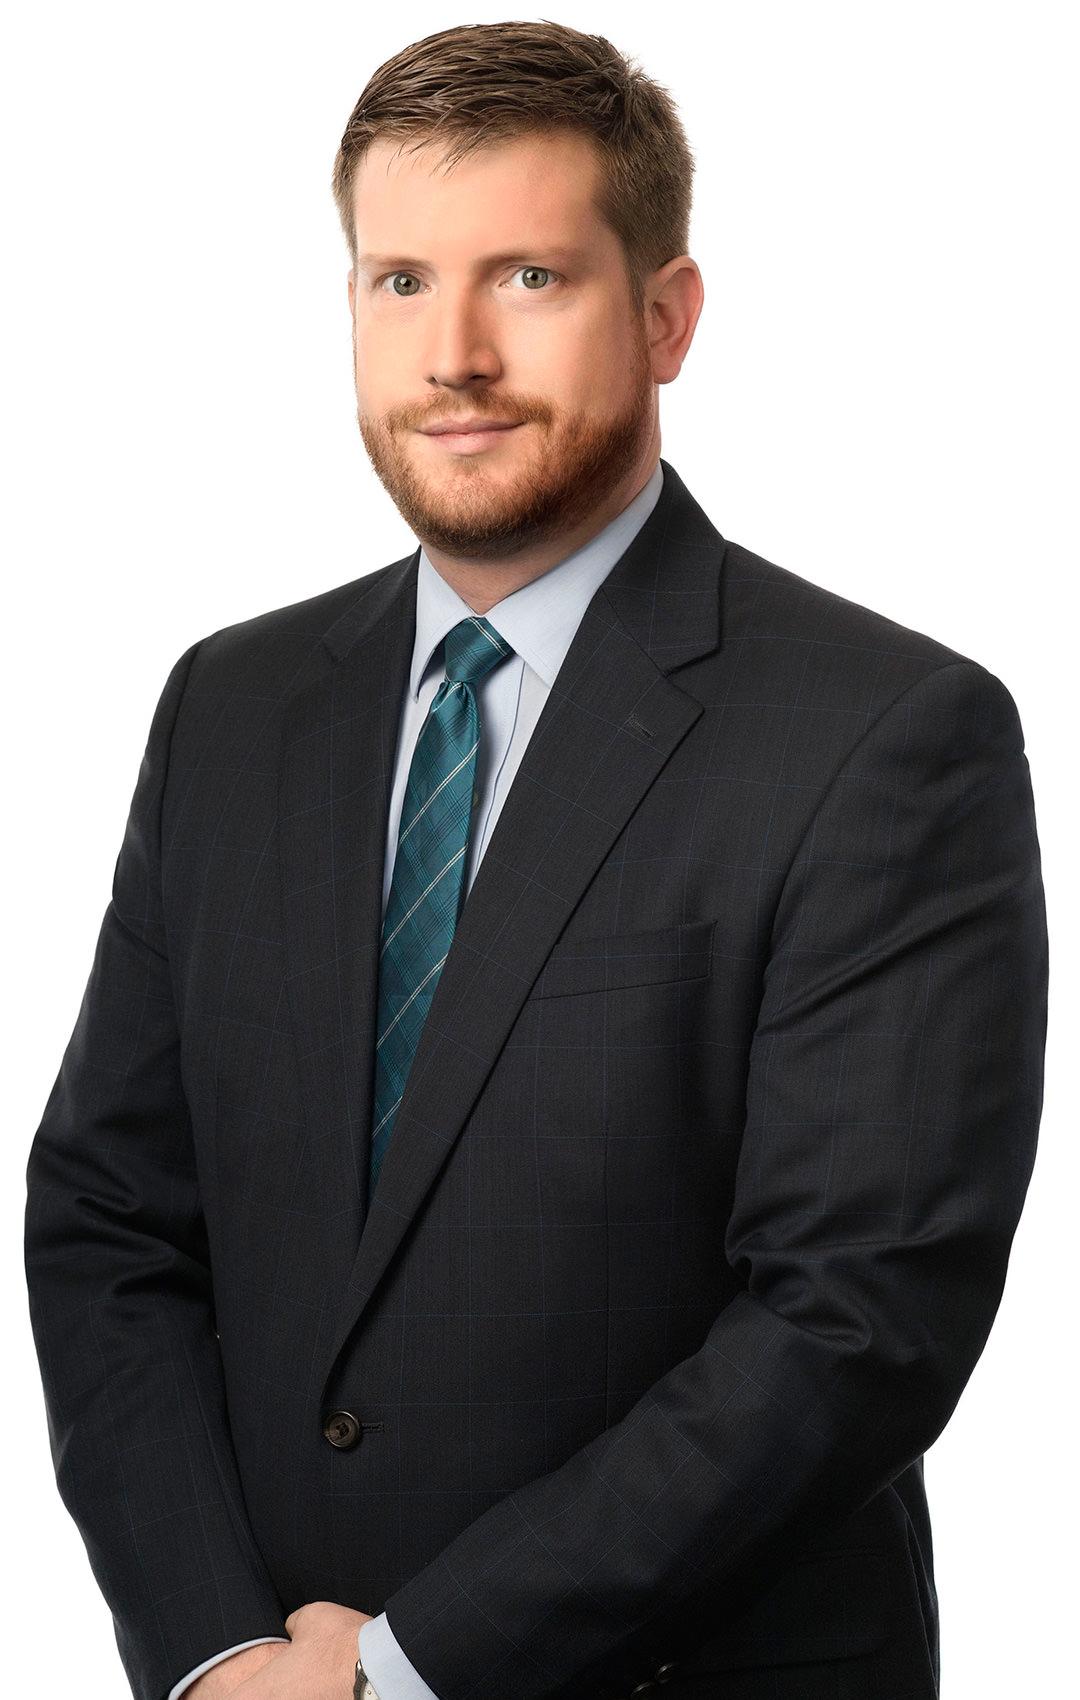 Daniel C. Lumm